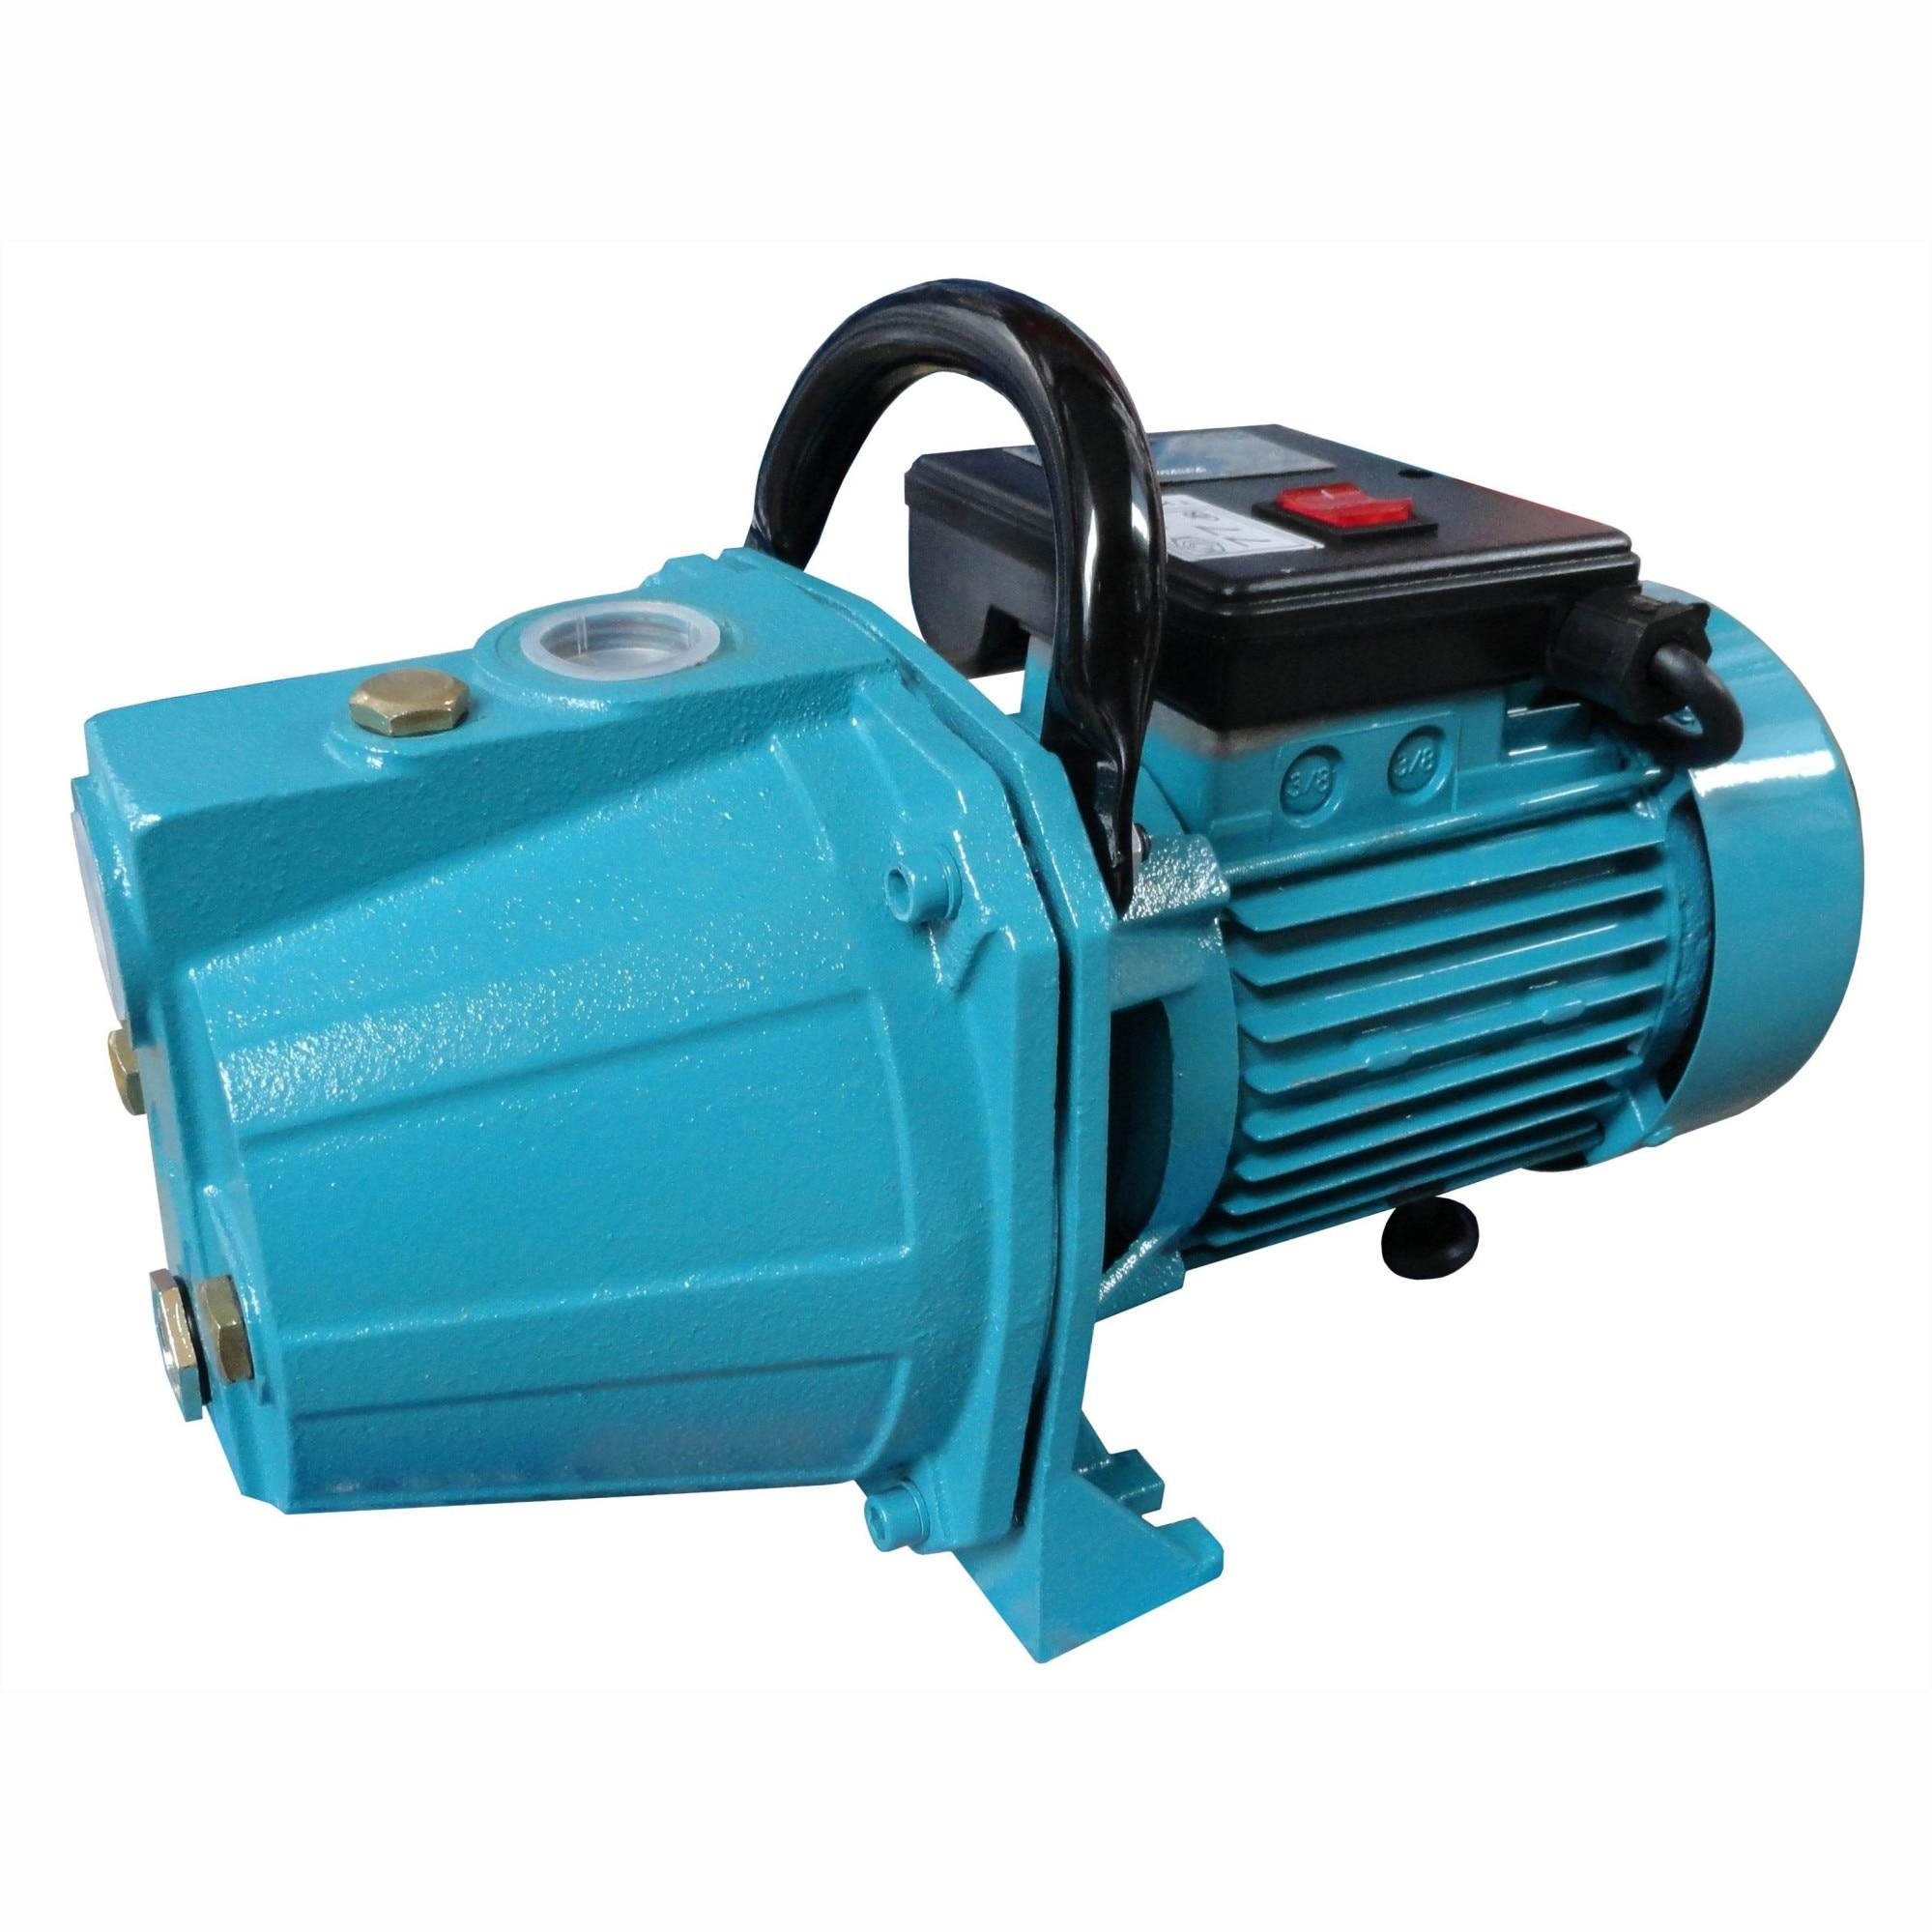 Fotografie Pompa apa Wasserkonig Eco WKE8-44, 900 W, 3000 l/h debit apa, 4.4 bar presiune maxima, 44 m inaltime refulare, 8 m adancime absorbtie